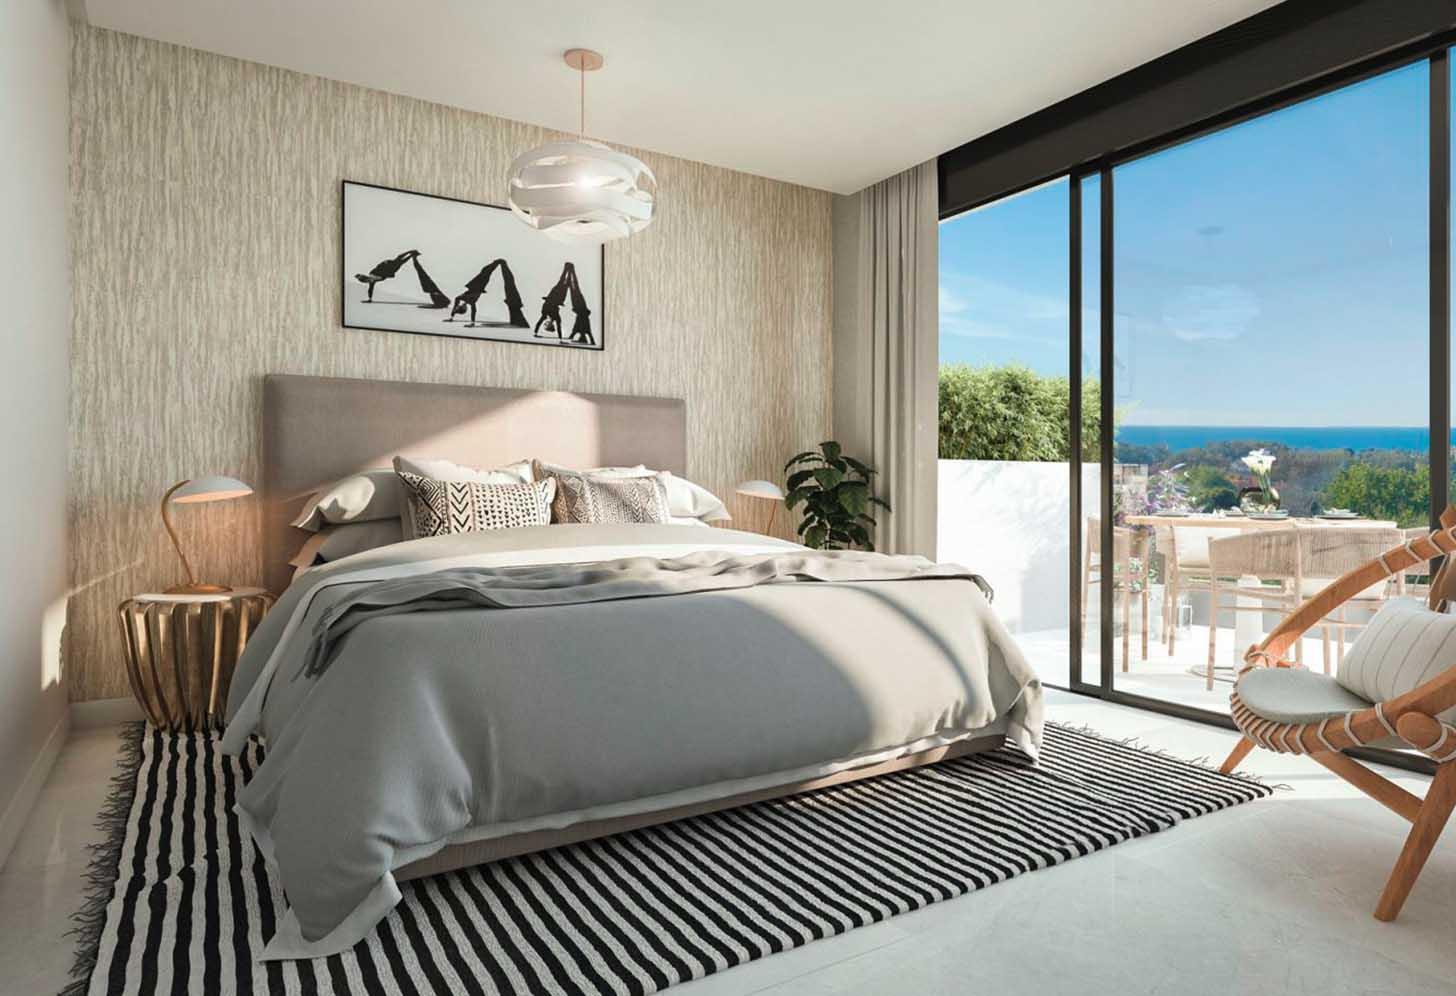 immobilier neuf espagne costa sol artola 2